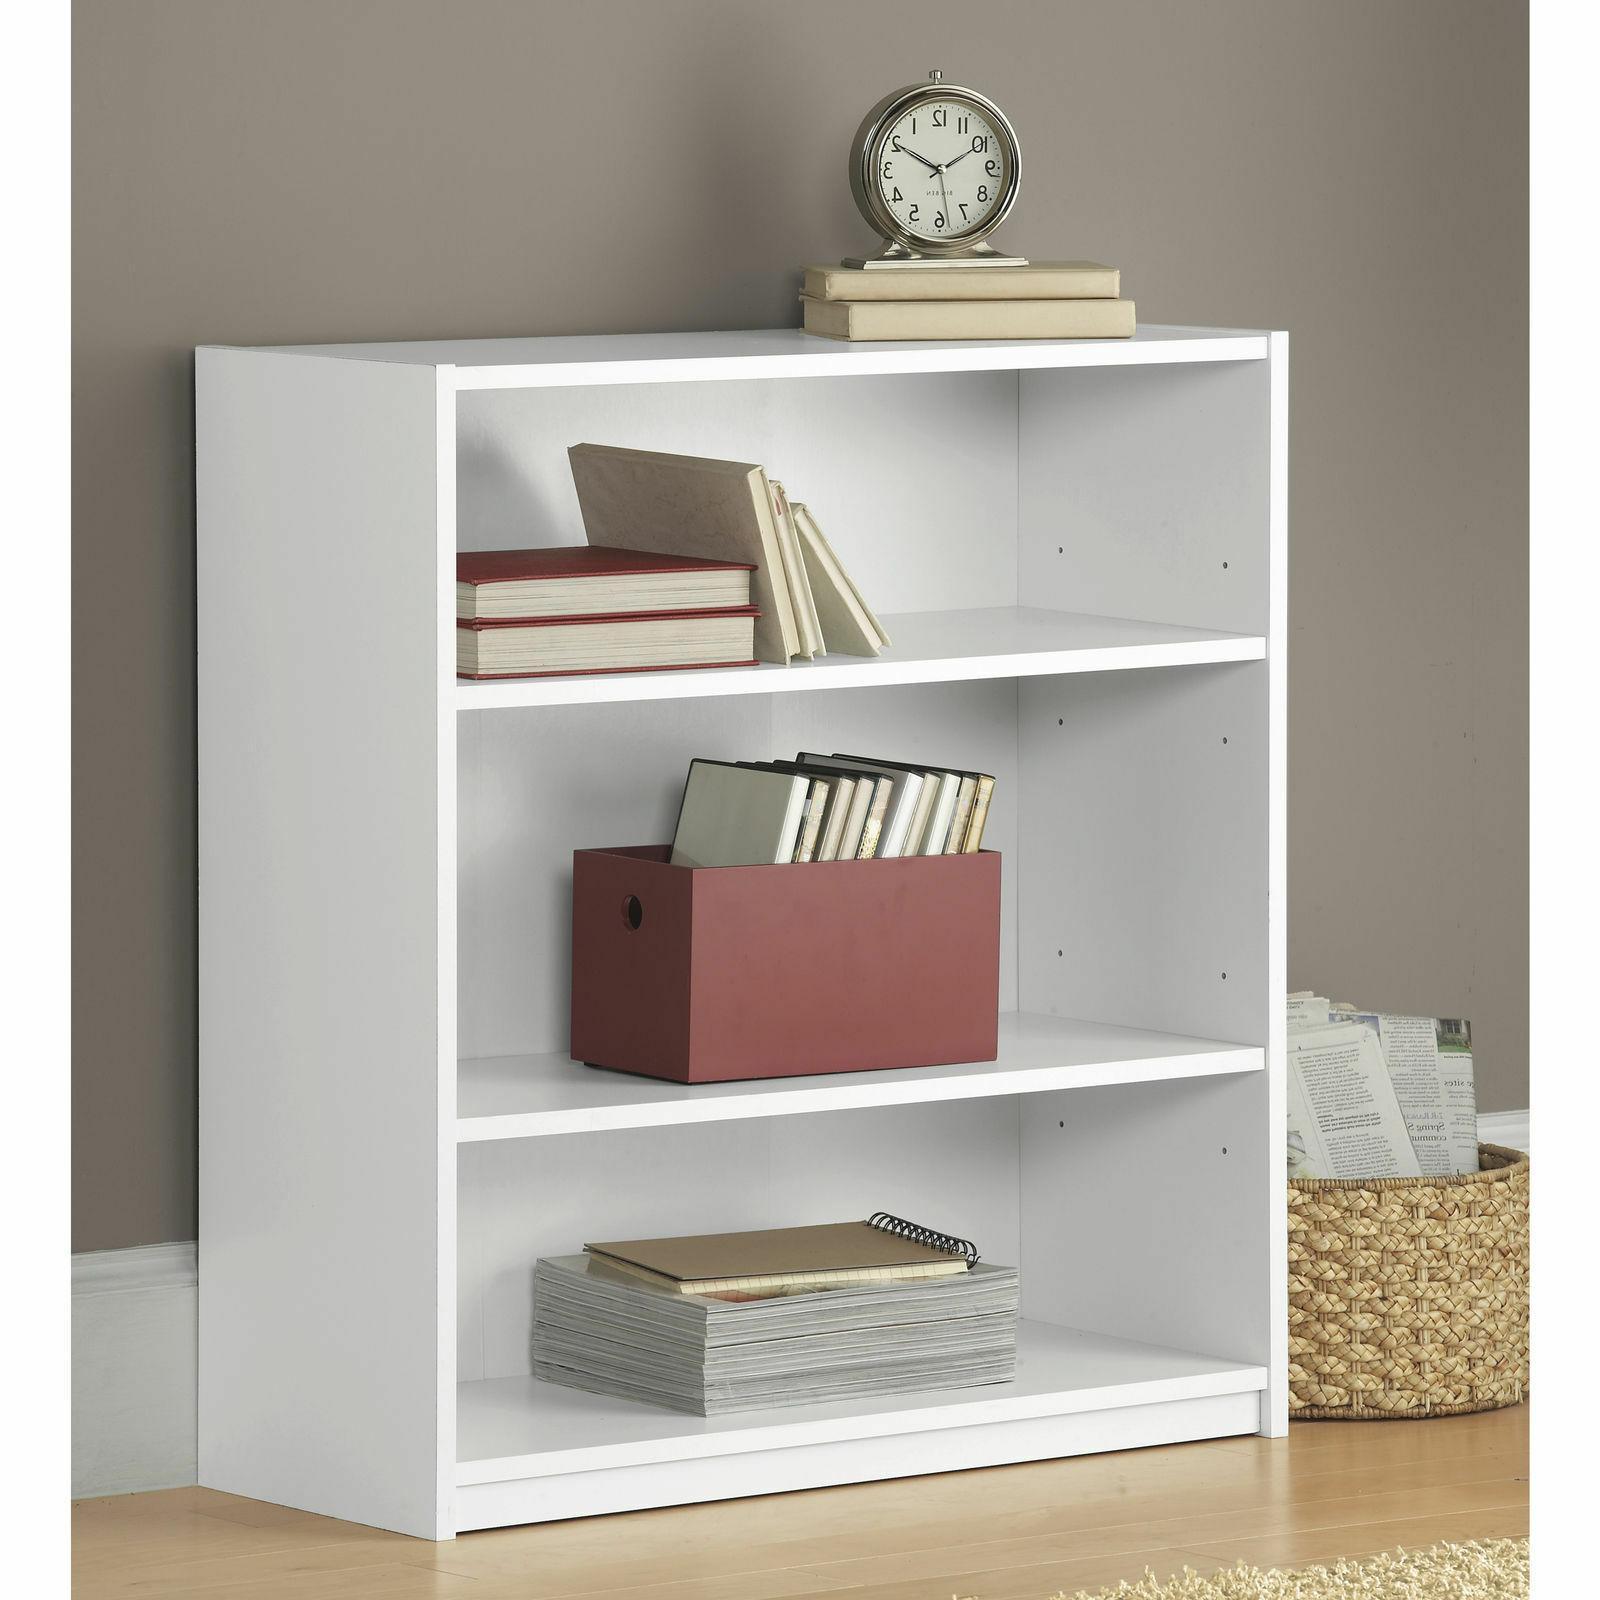 Adjustable Wood Bookcase Storage Wide Shelving